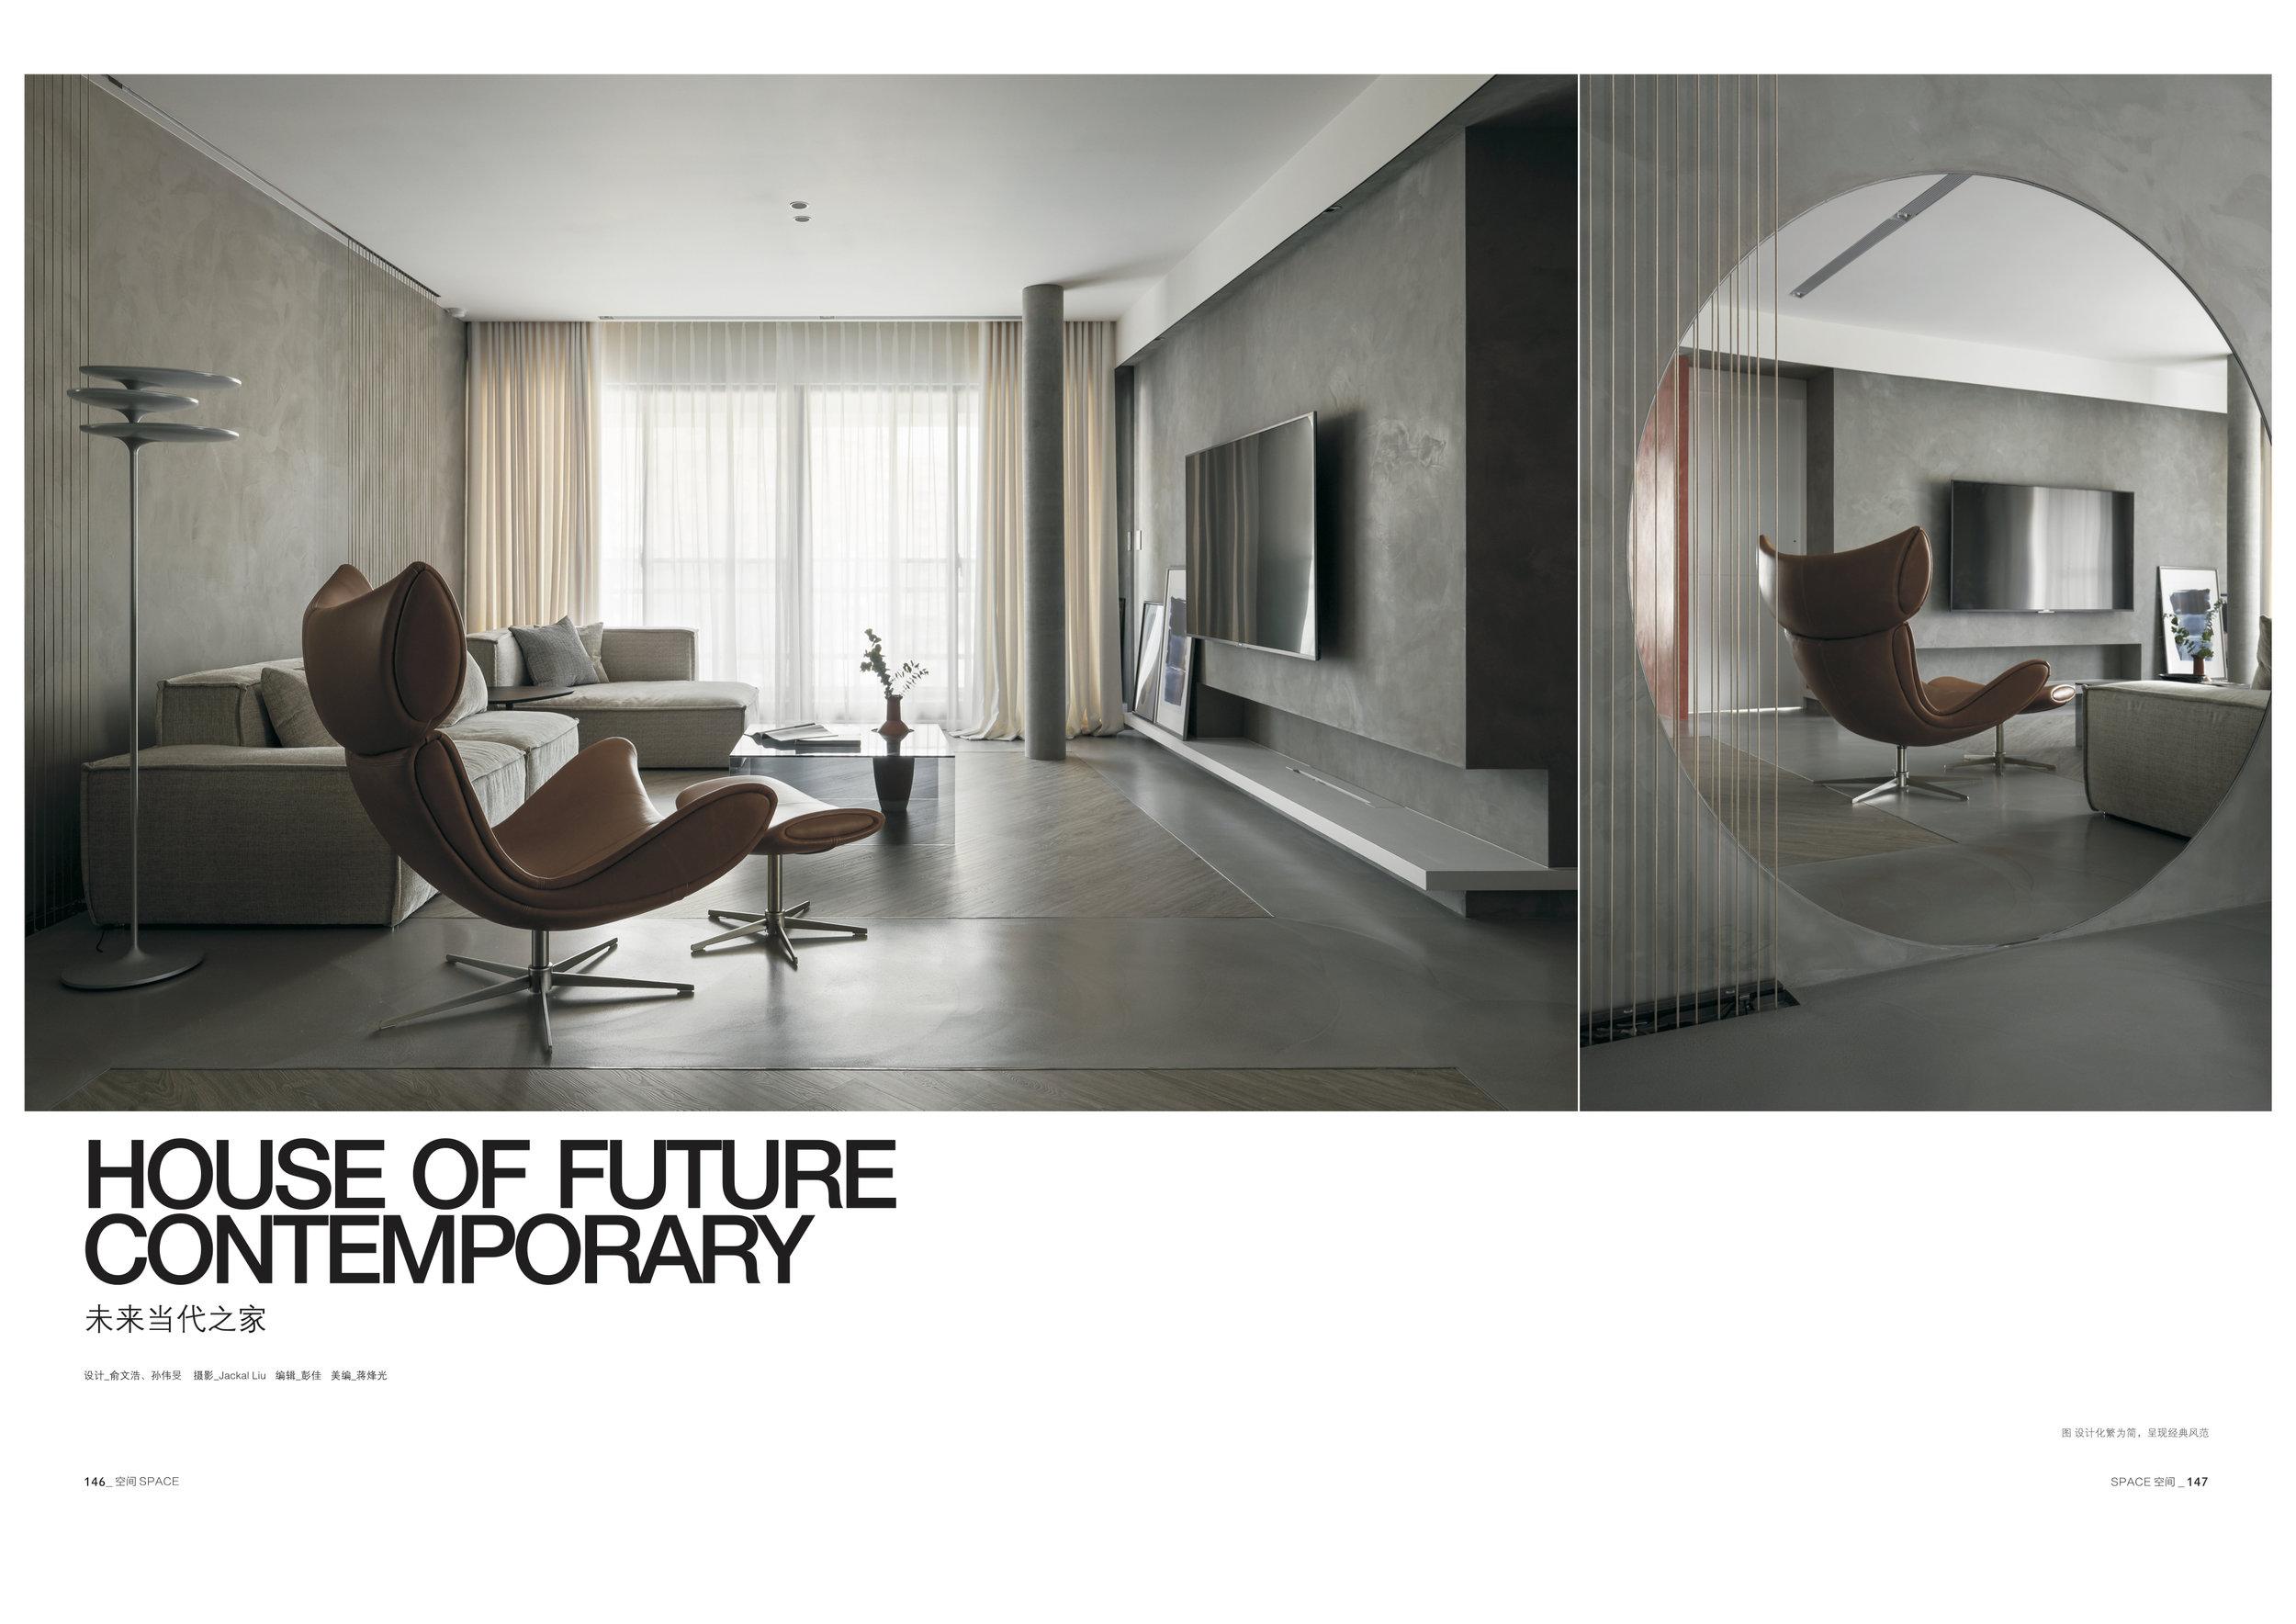 p146-151空间_未来当代之家1.jpg